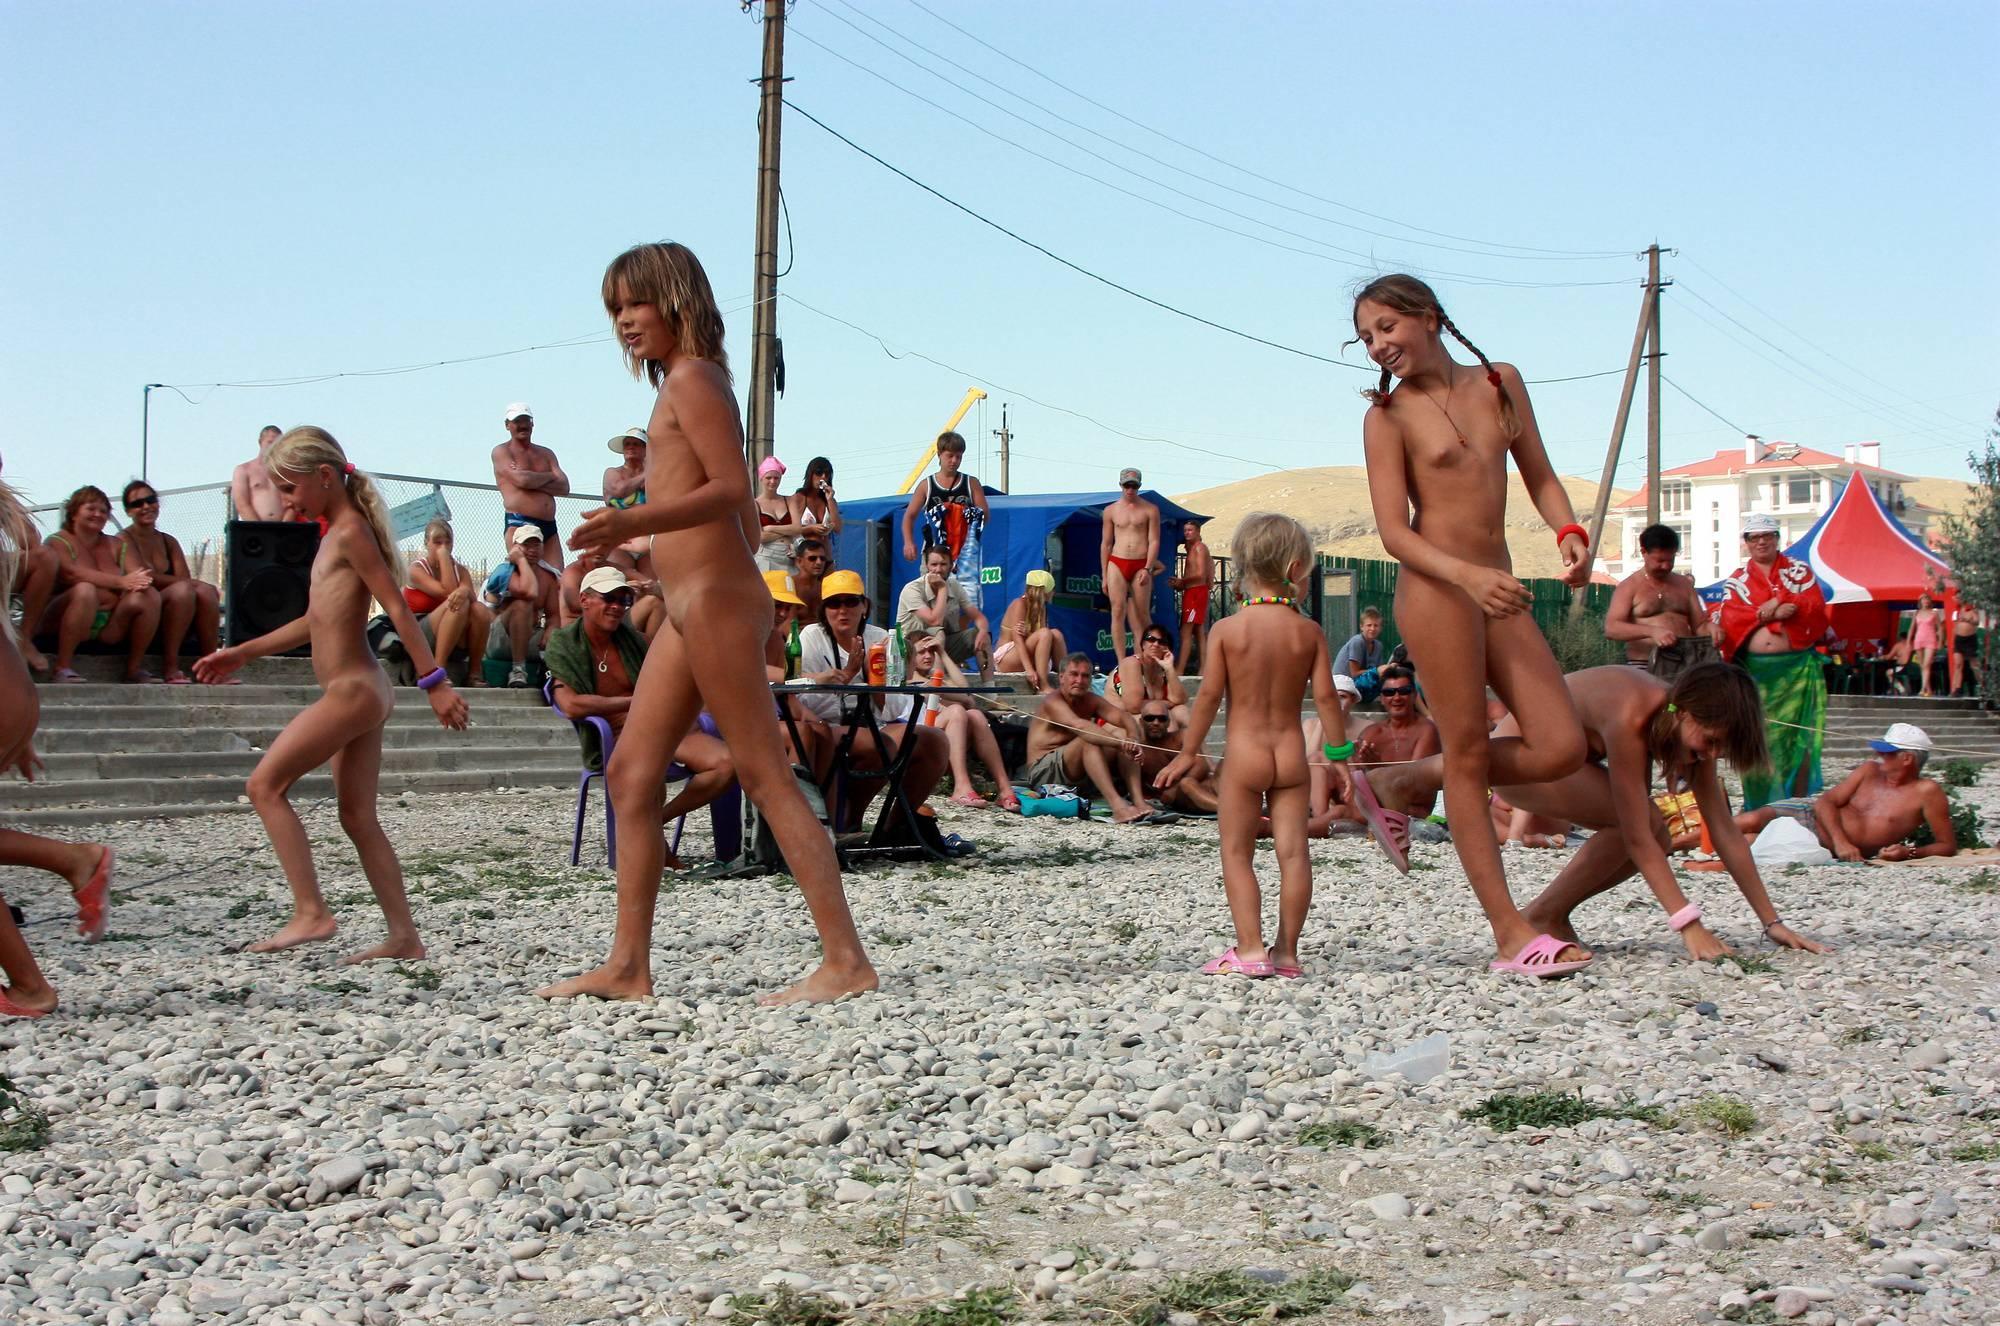 Nudist Gallery Nude Contestant Walk-Off - 2